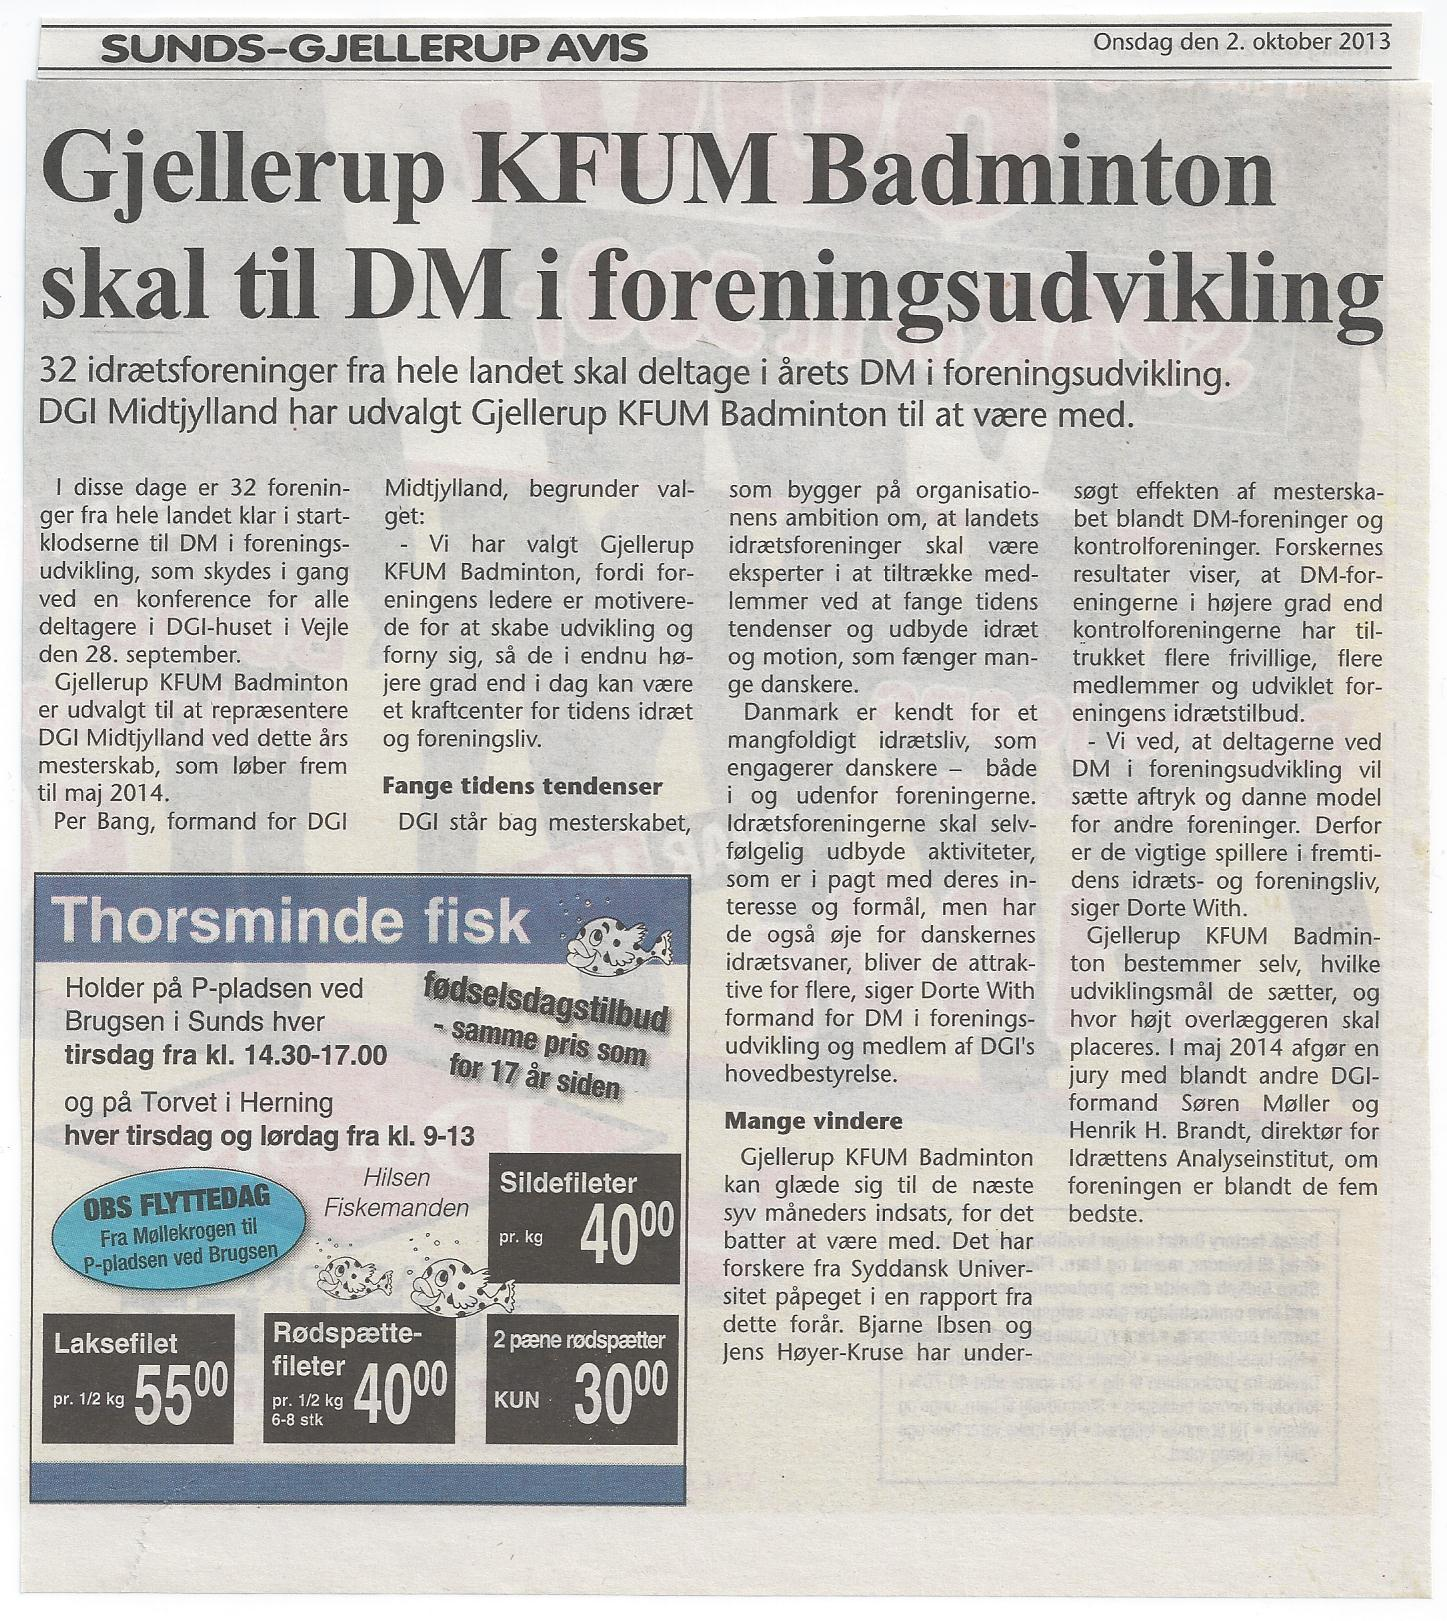 dm_i_forening